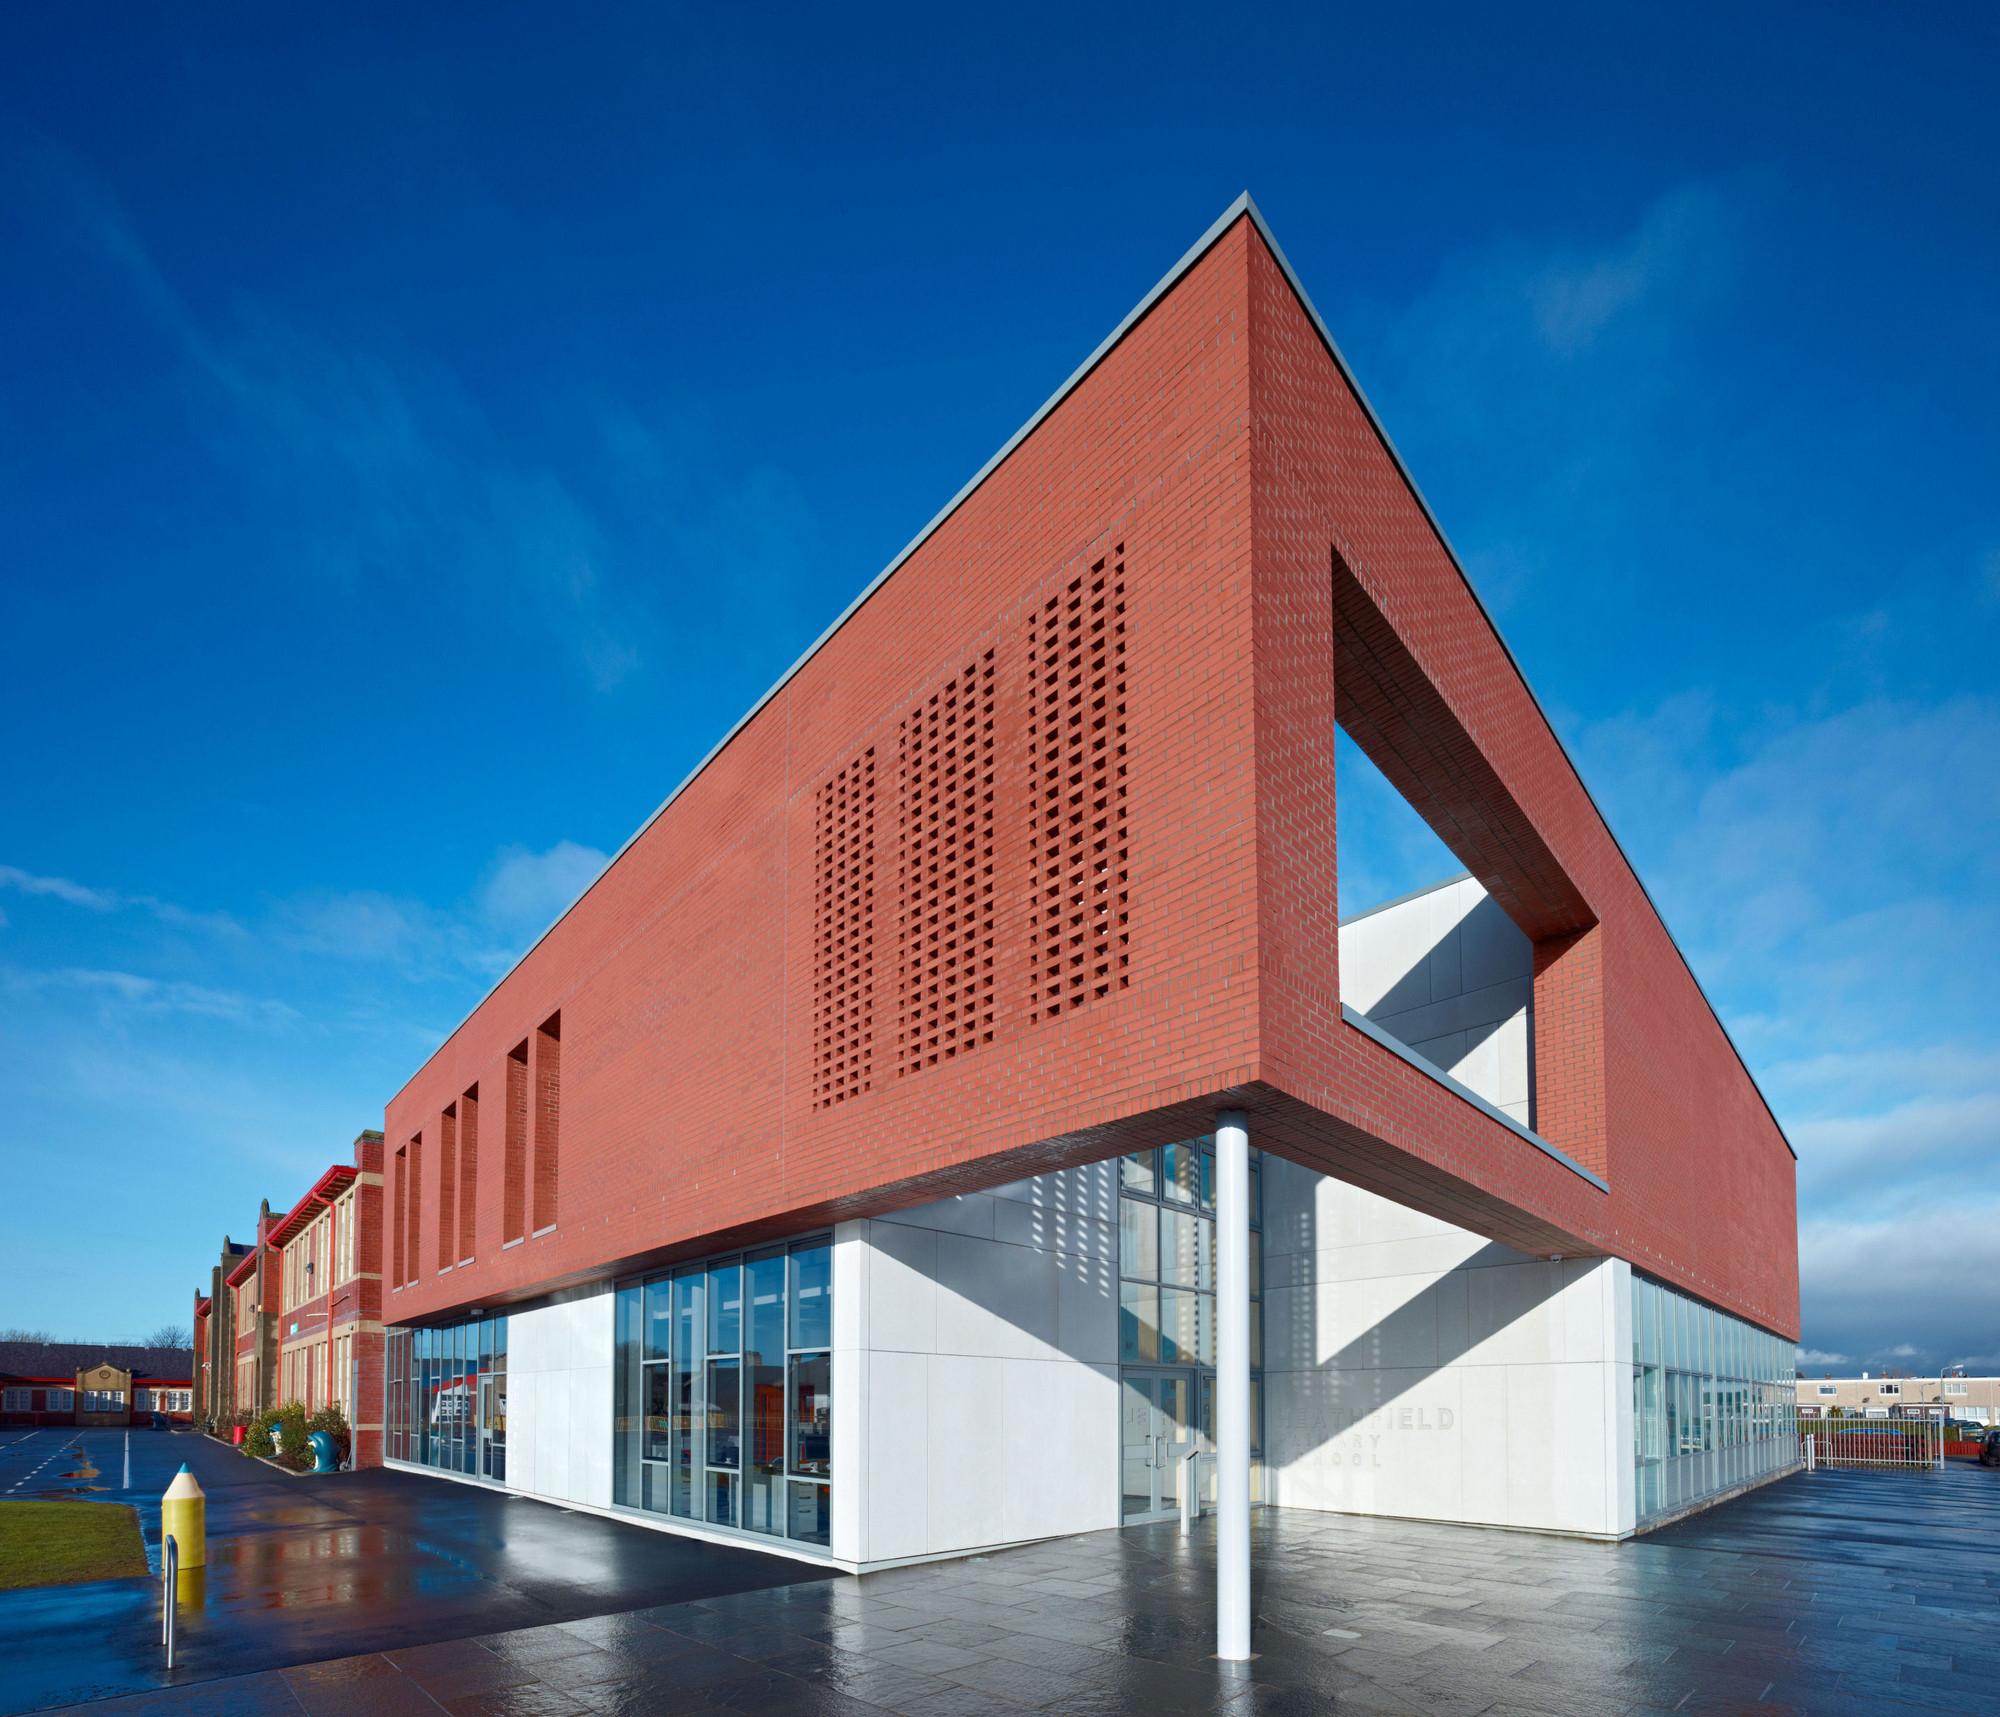 Heathfield Primary School / Holmes Miller Architect, © Andrew Lee